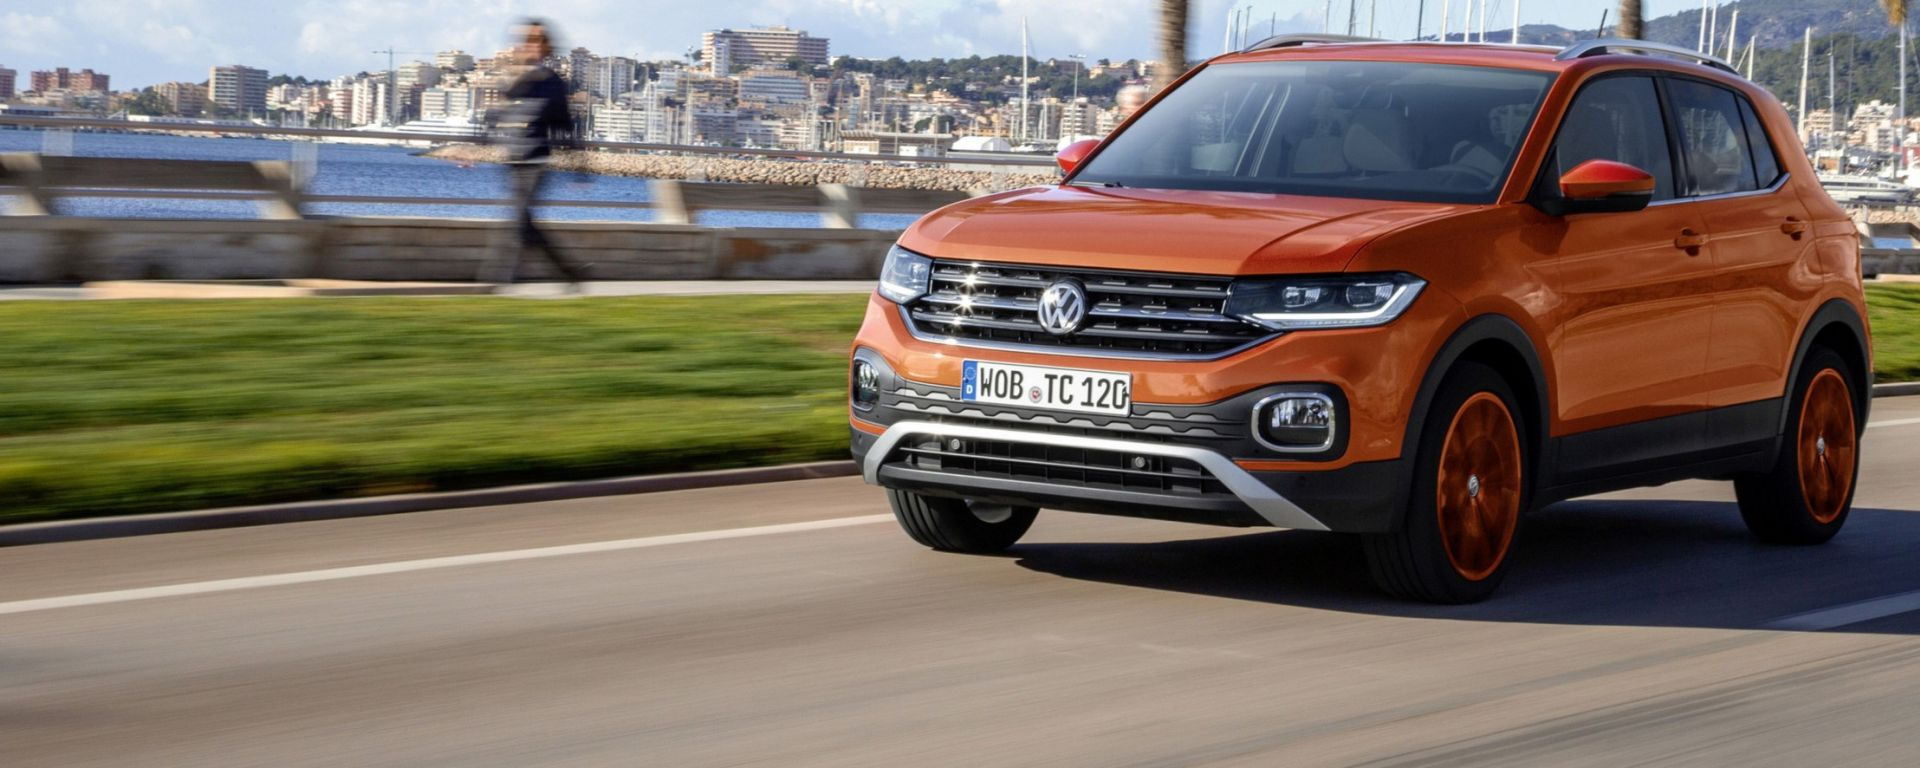 Volkswagen T-Cross, in arrivo la carrozzeria coupè